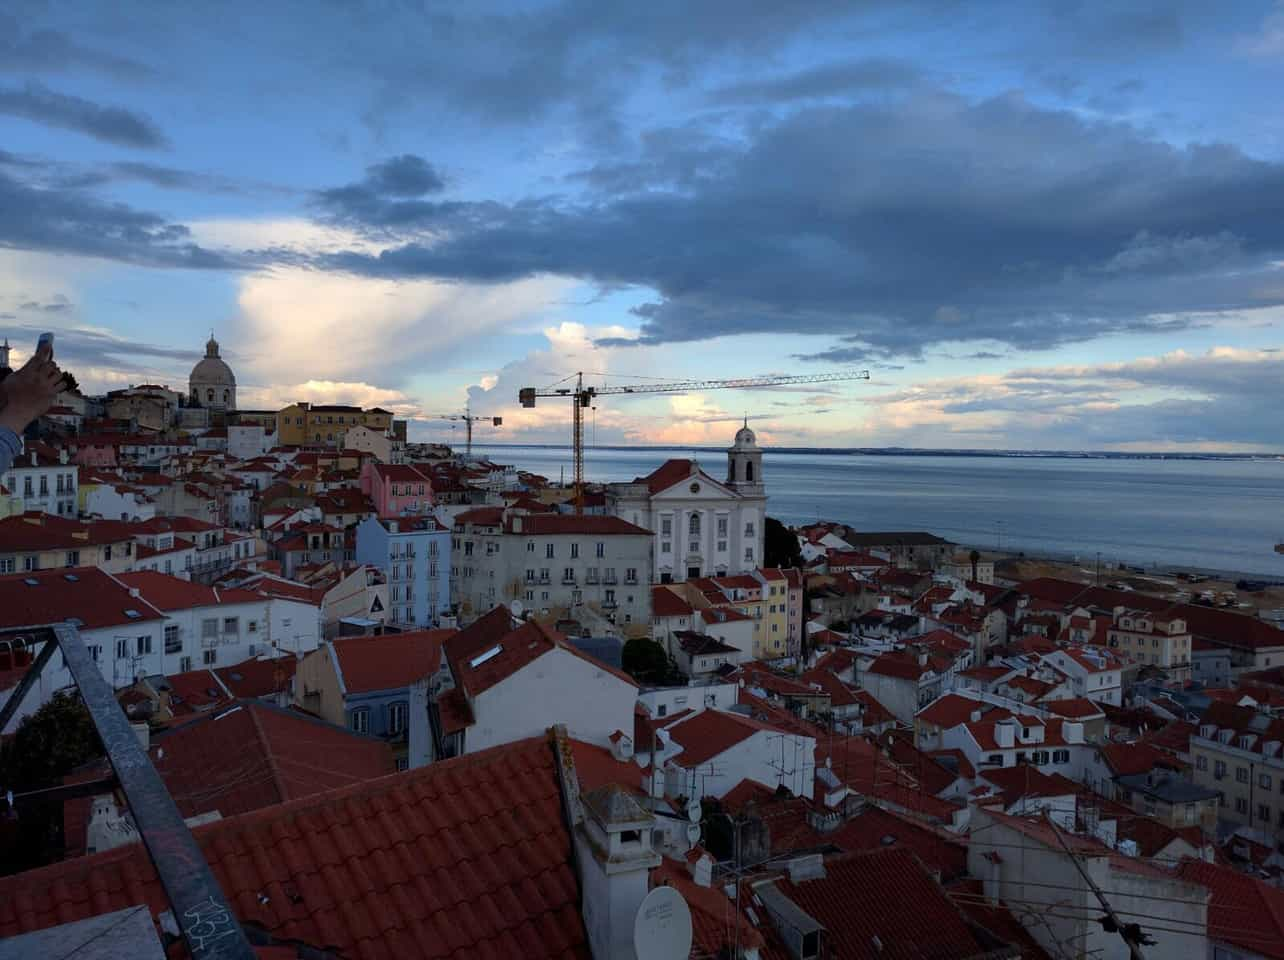 #whyirunlisboa – Tide Runners go Lisboa